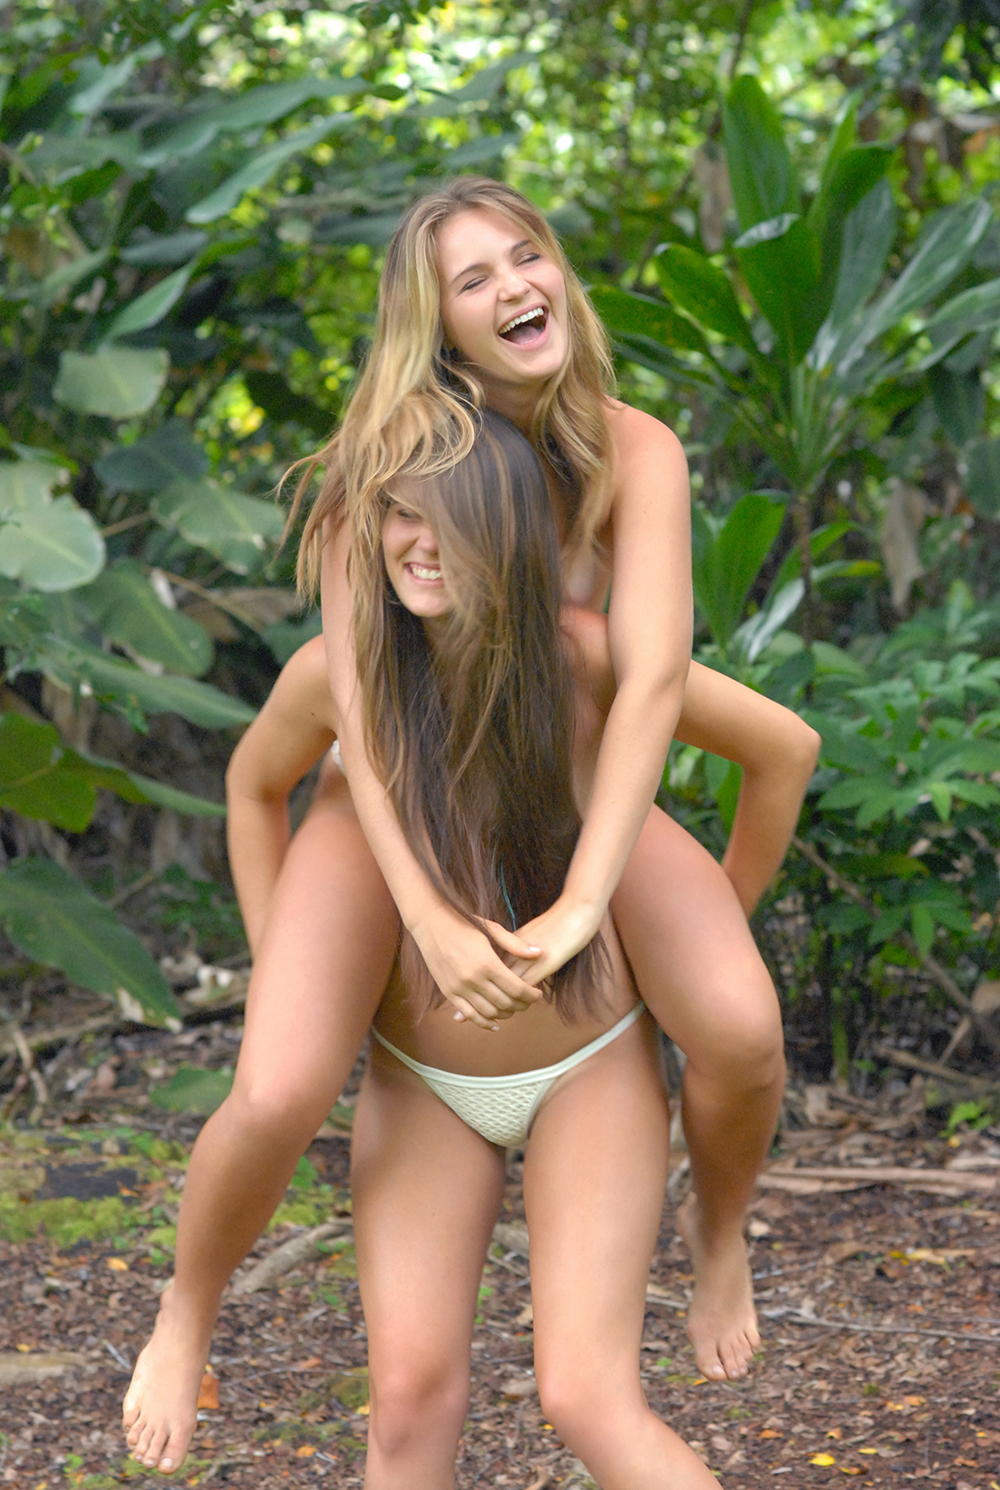 Swimbook_swimsuit_Posh_Pua_Sydney_and_Hayley_Barcia_DSC_0596.JPG